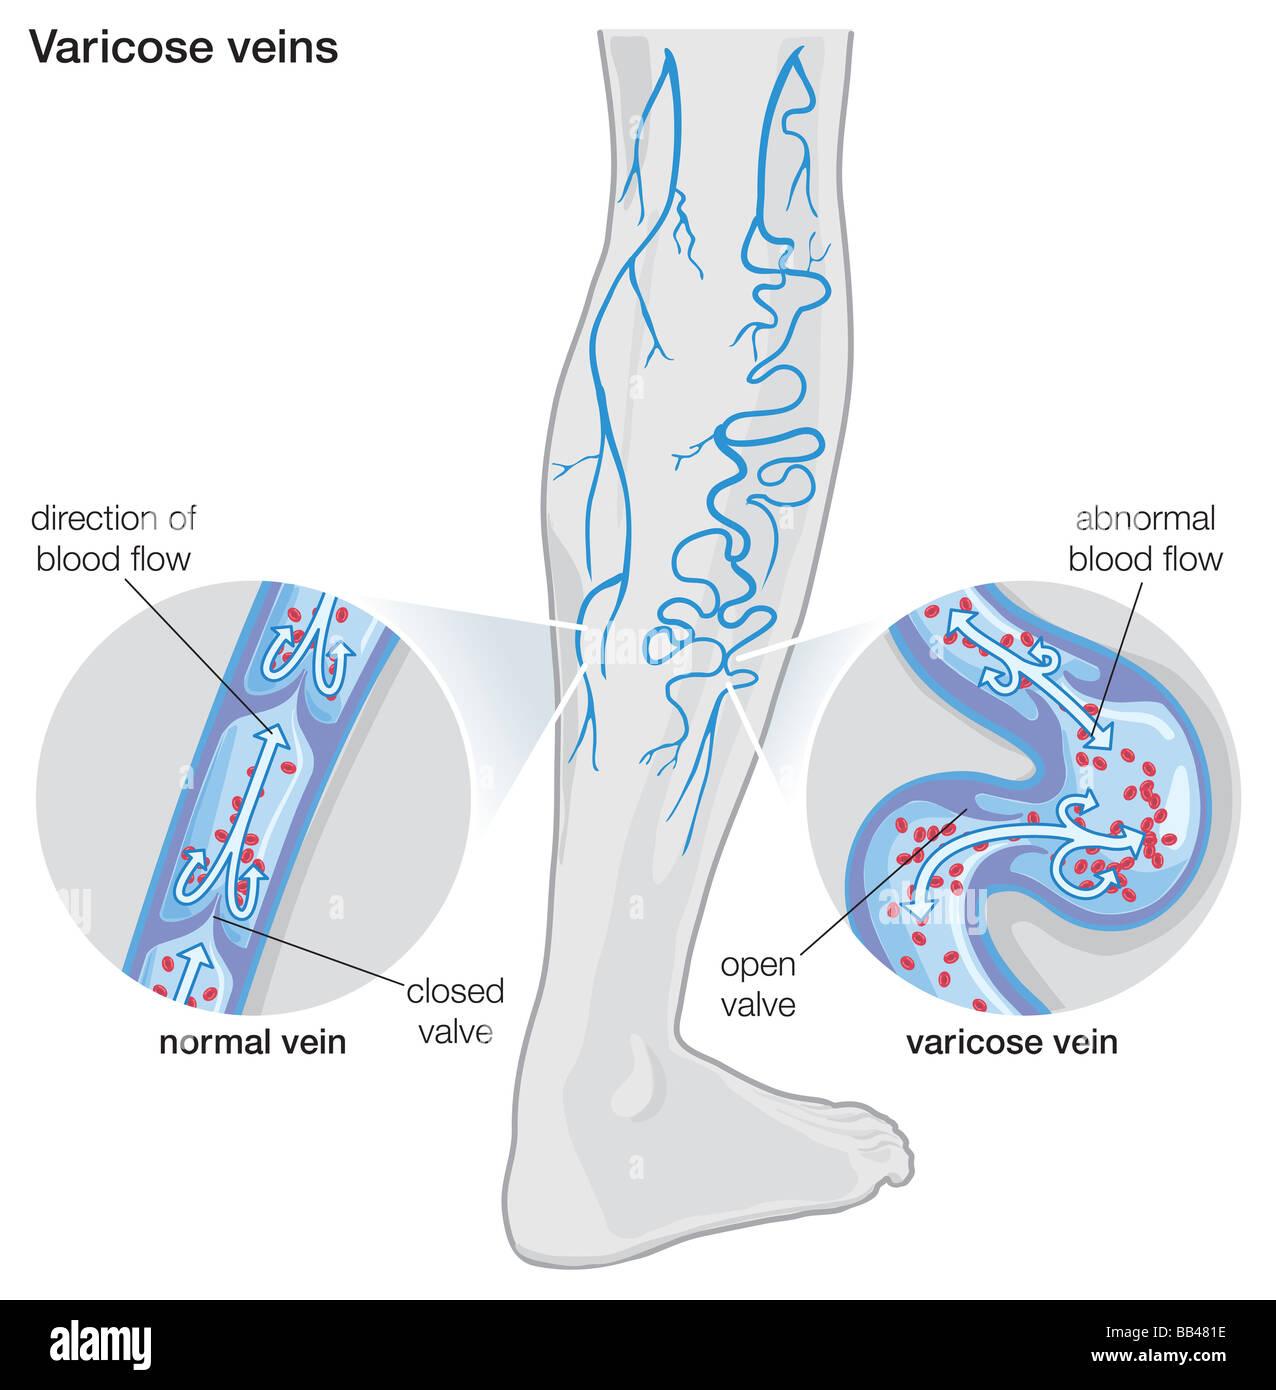 hight resolution of diagram illustrating varicose veins stock image